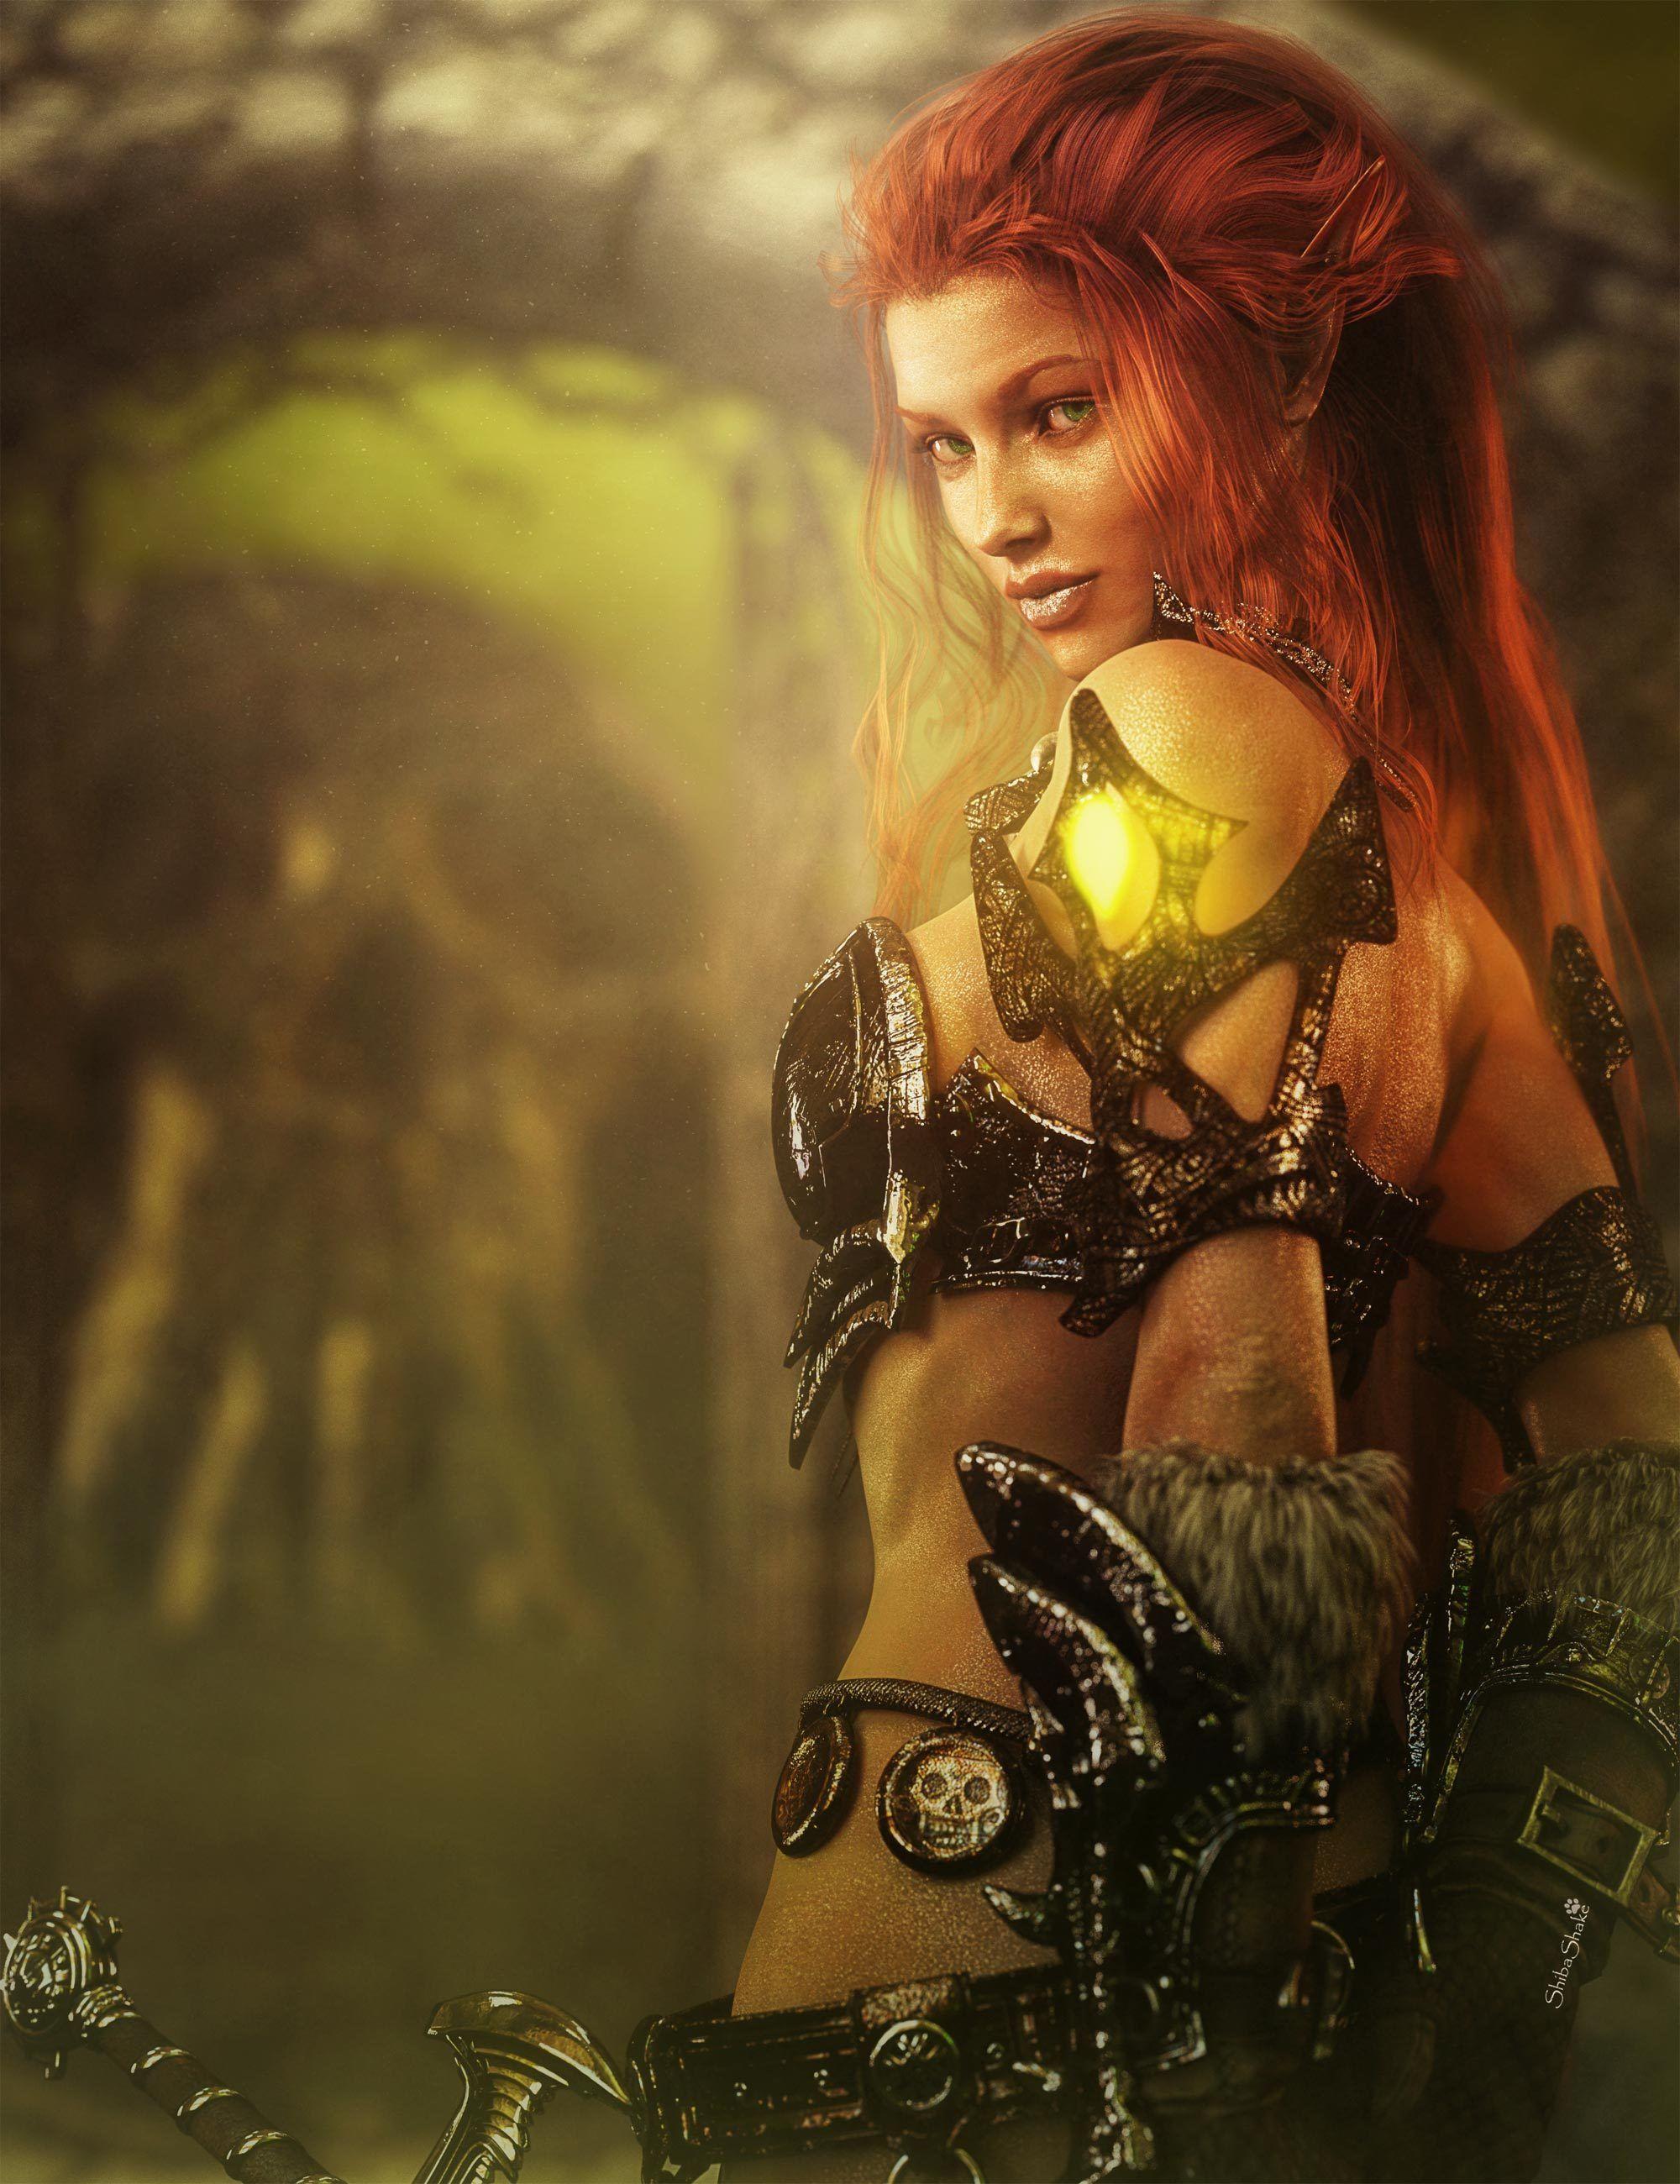 Gallery Girl Redhead